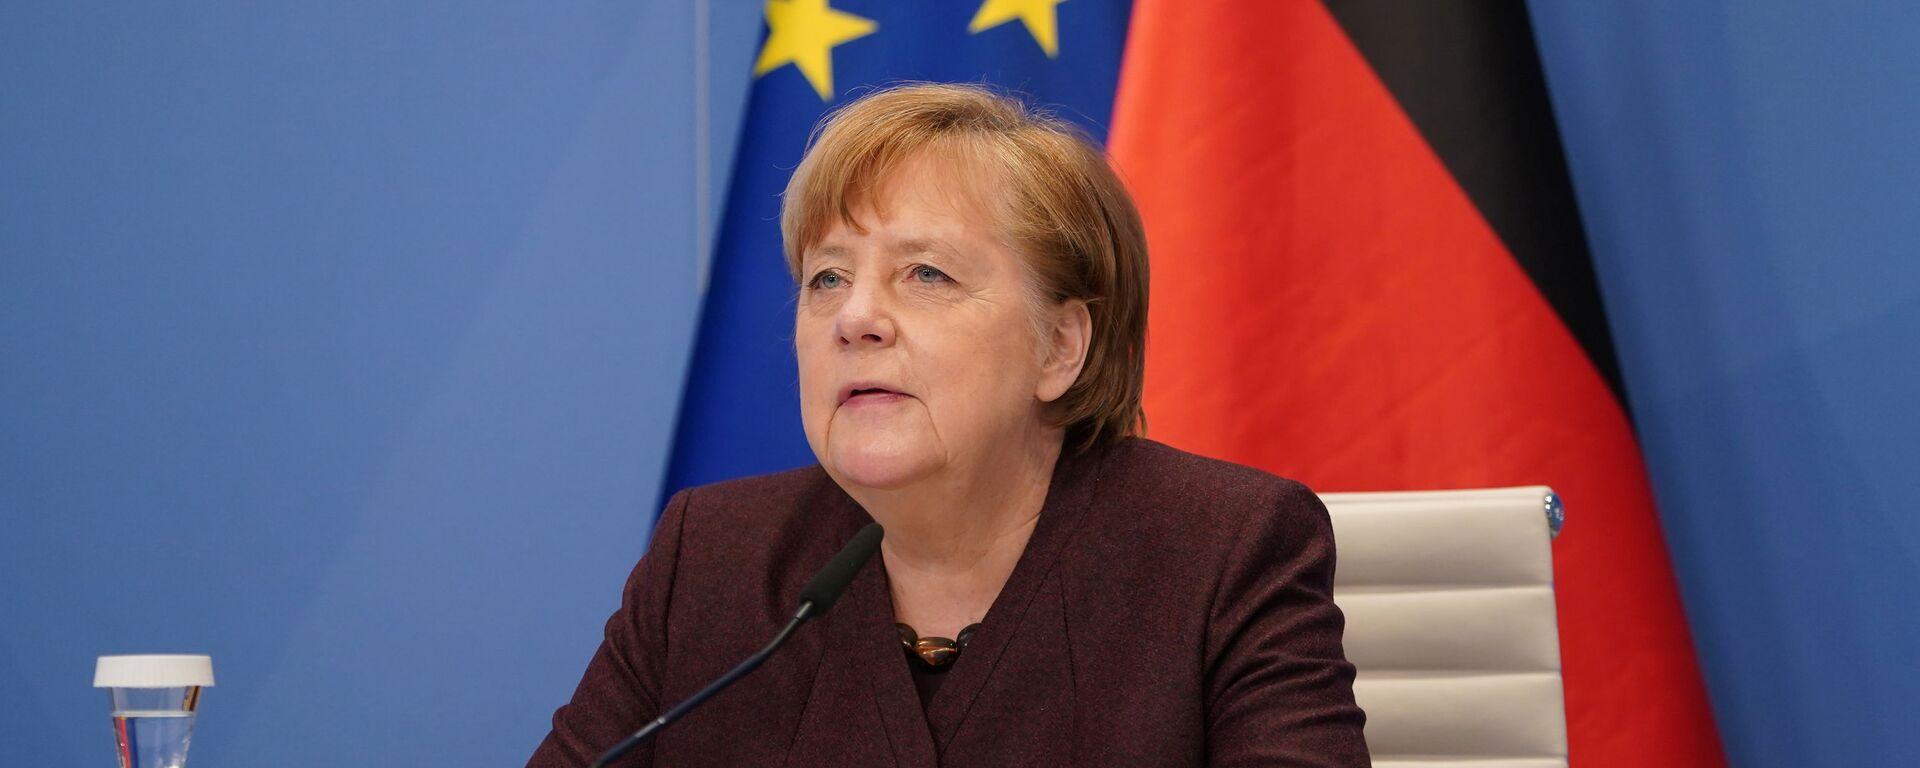 Angela Merkel, canciller alemana - Sputnik Mundo, 1920, 24.06.2021